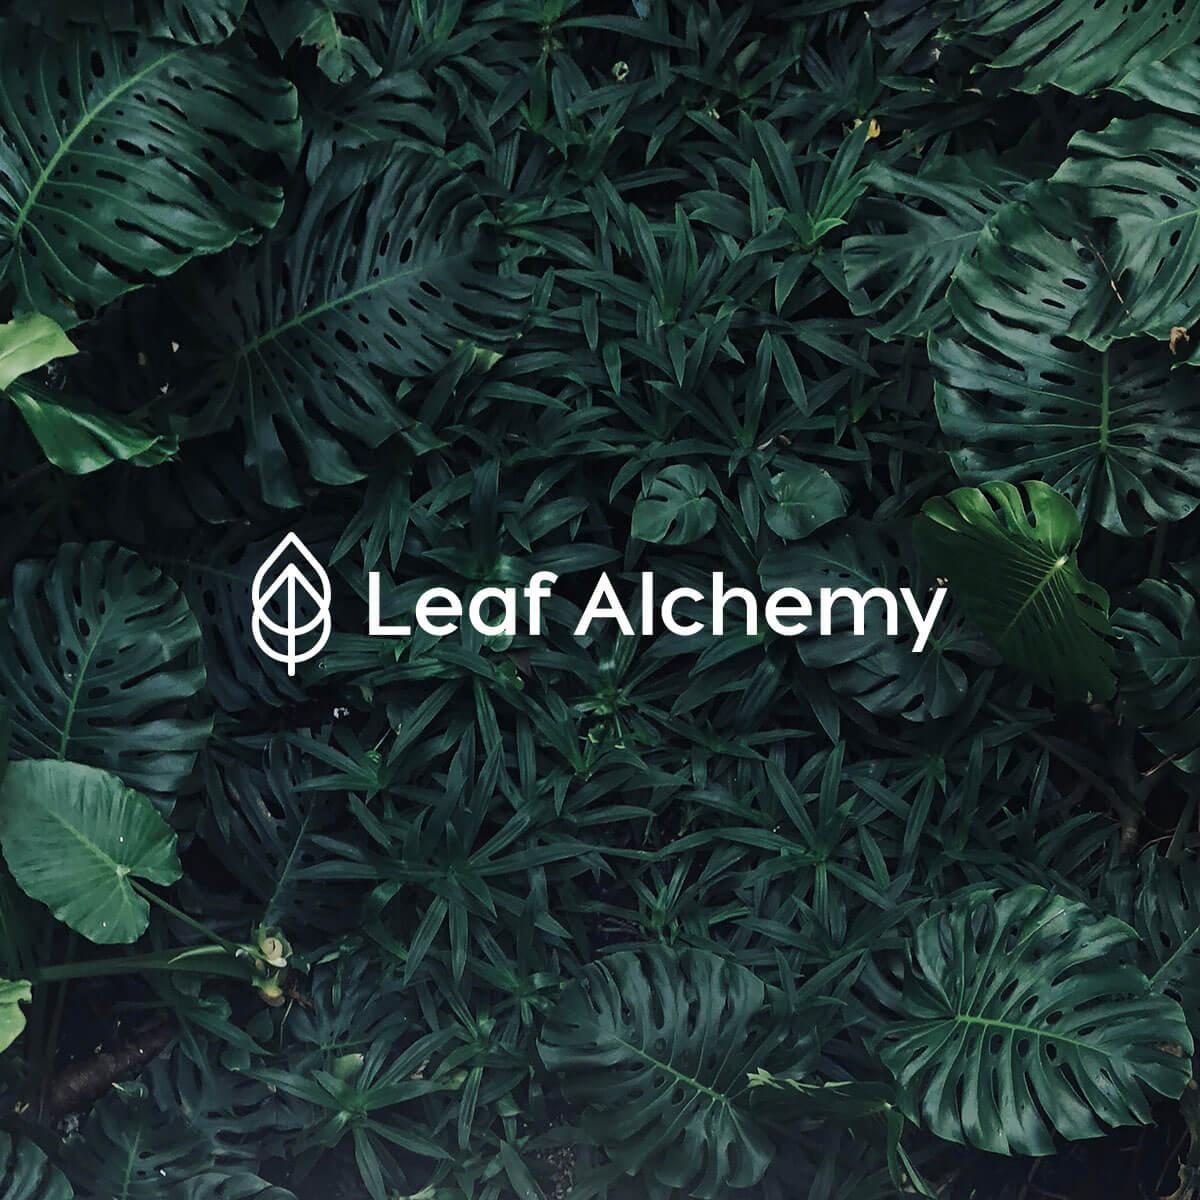 LeafAlchemy4.jpg